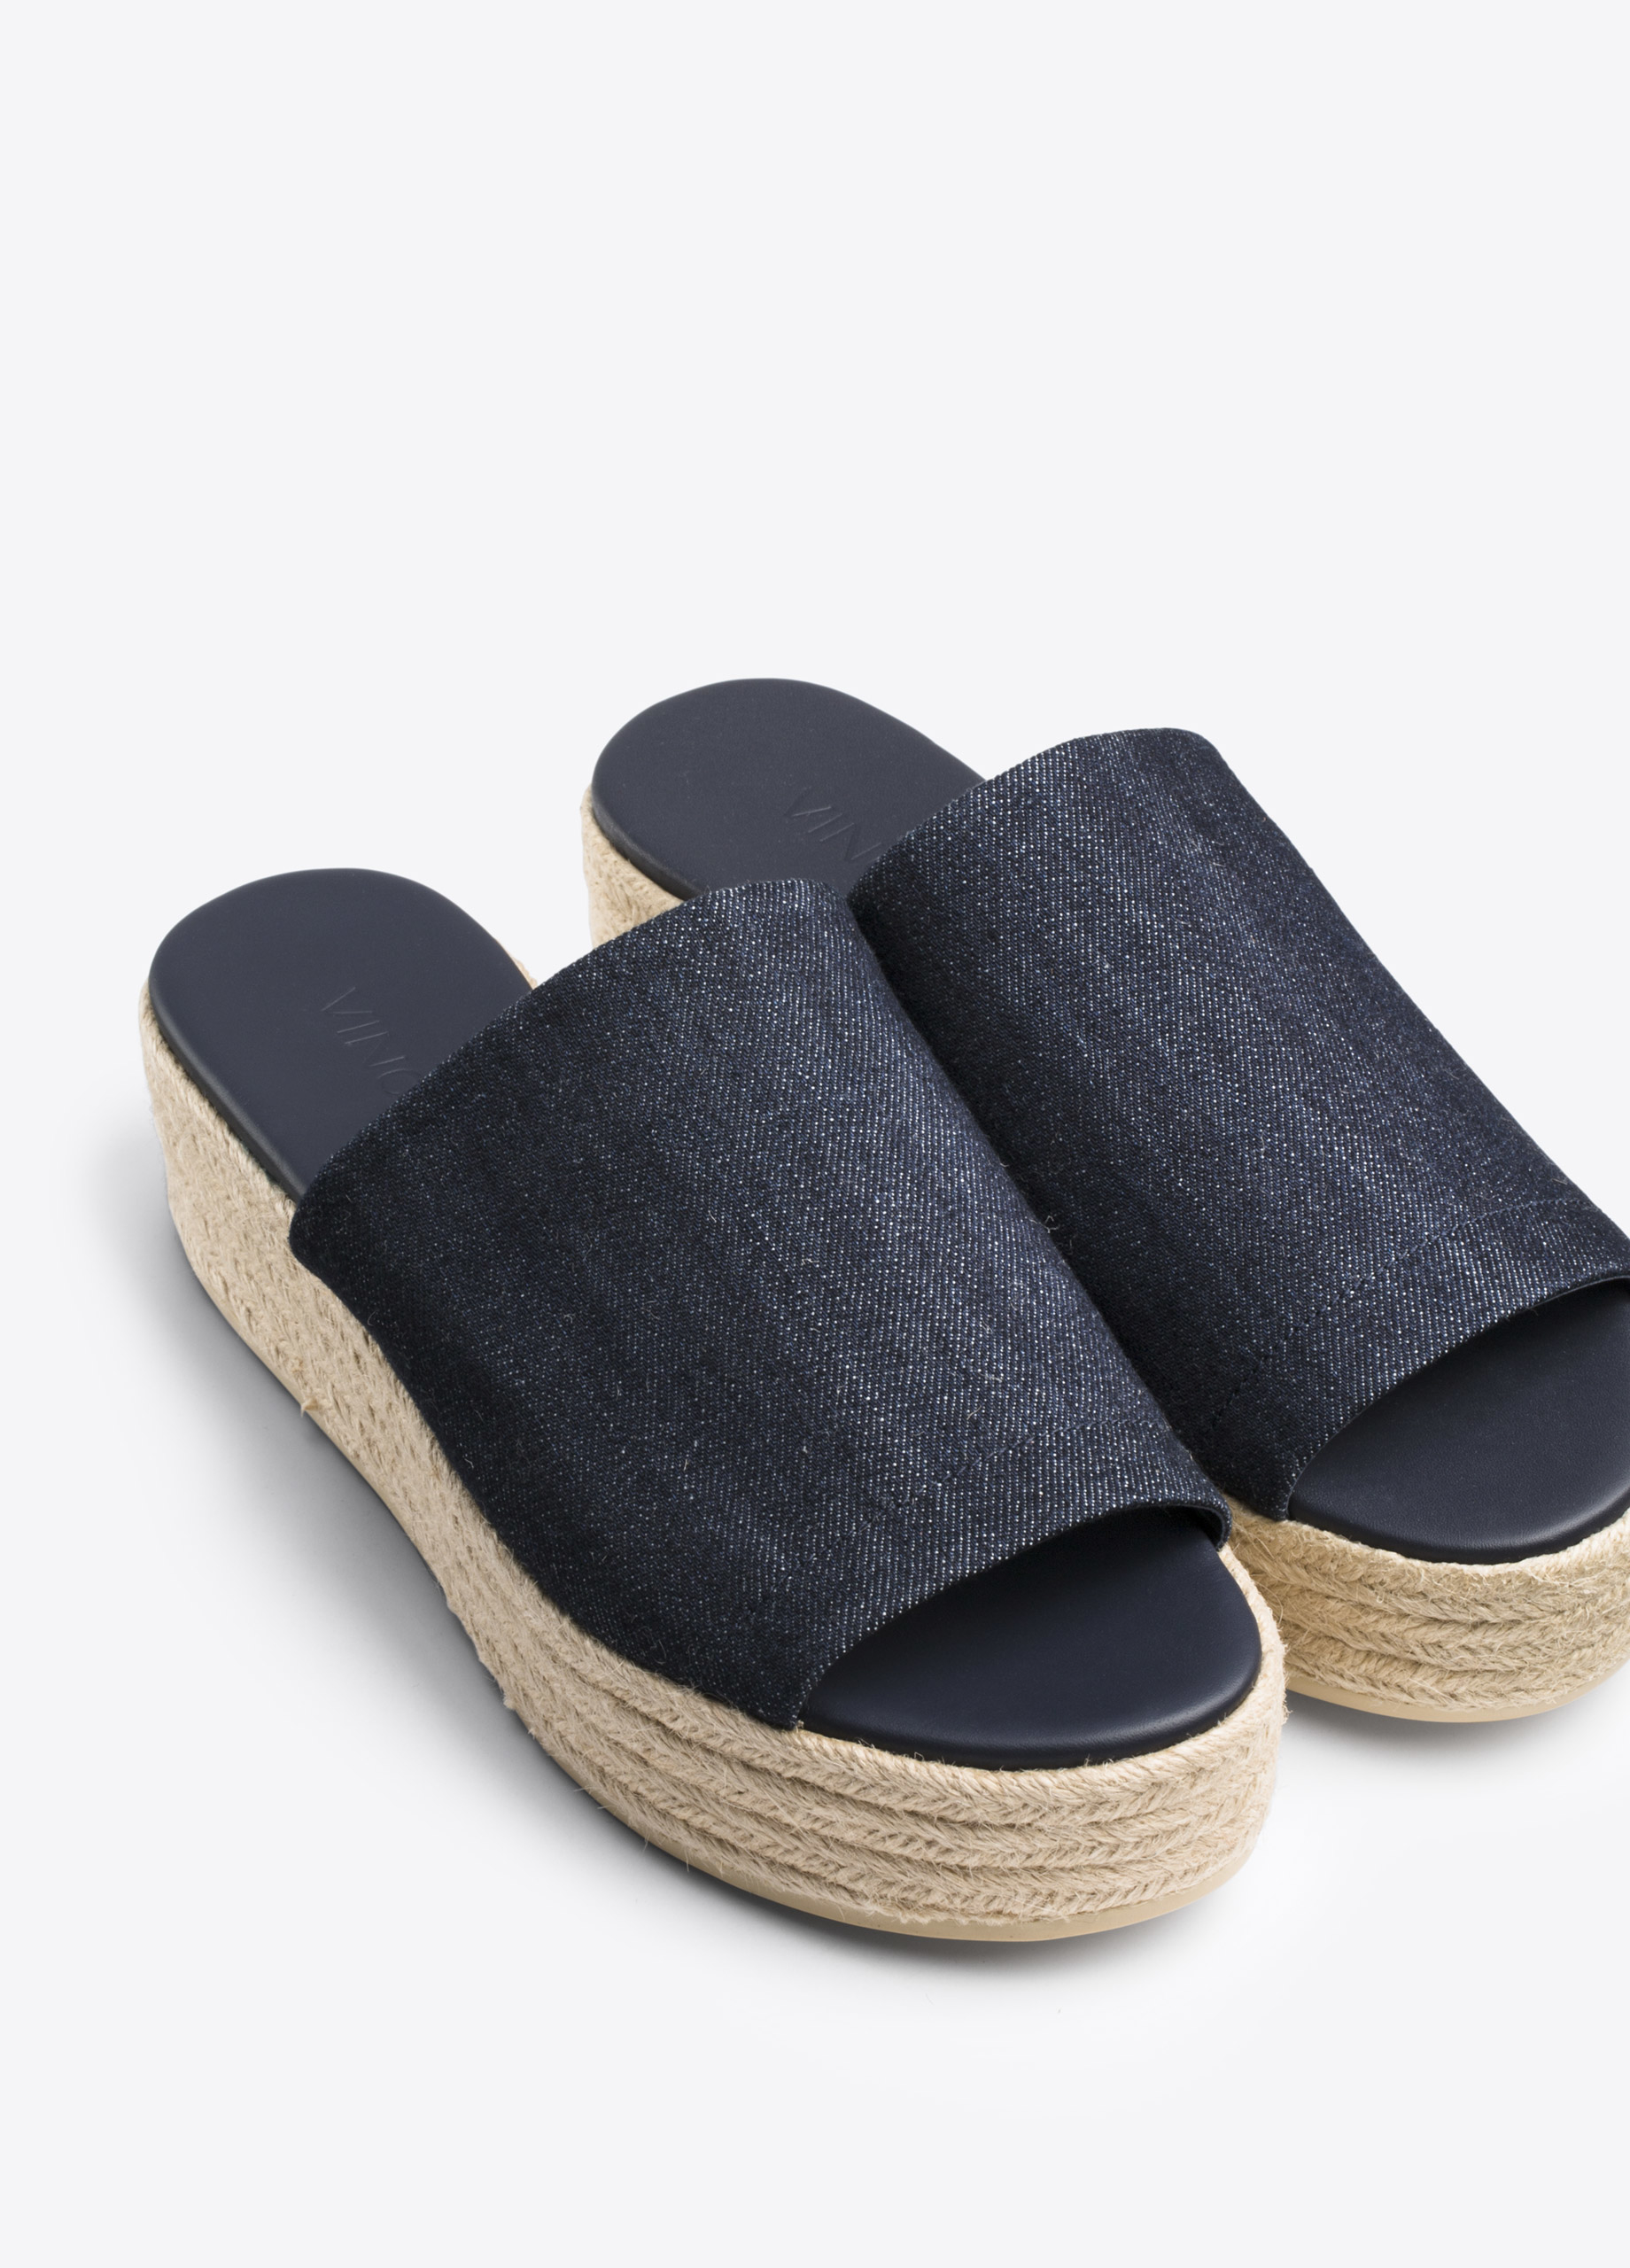 26f766c8f9a3 Vince Solana Denim Espadrille Flatform Sandal in Blue - Lyst